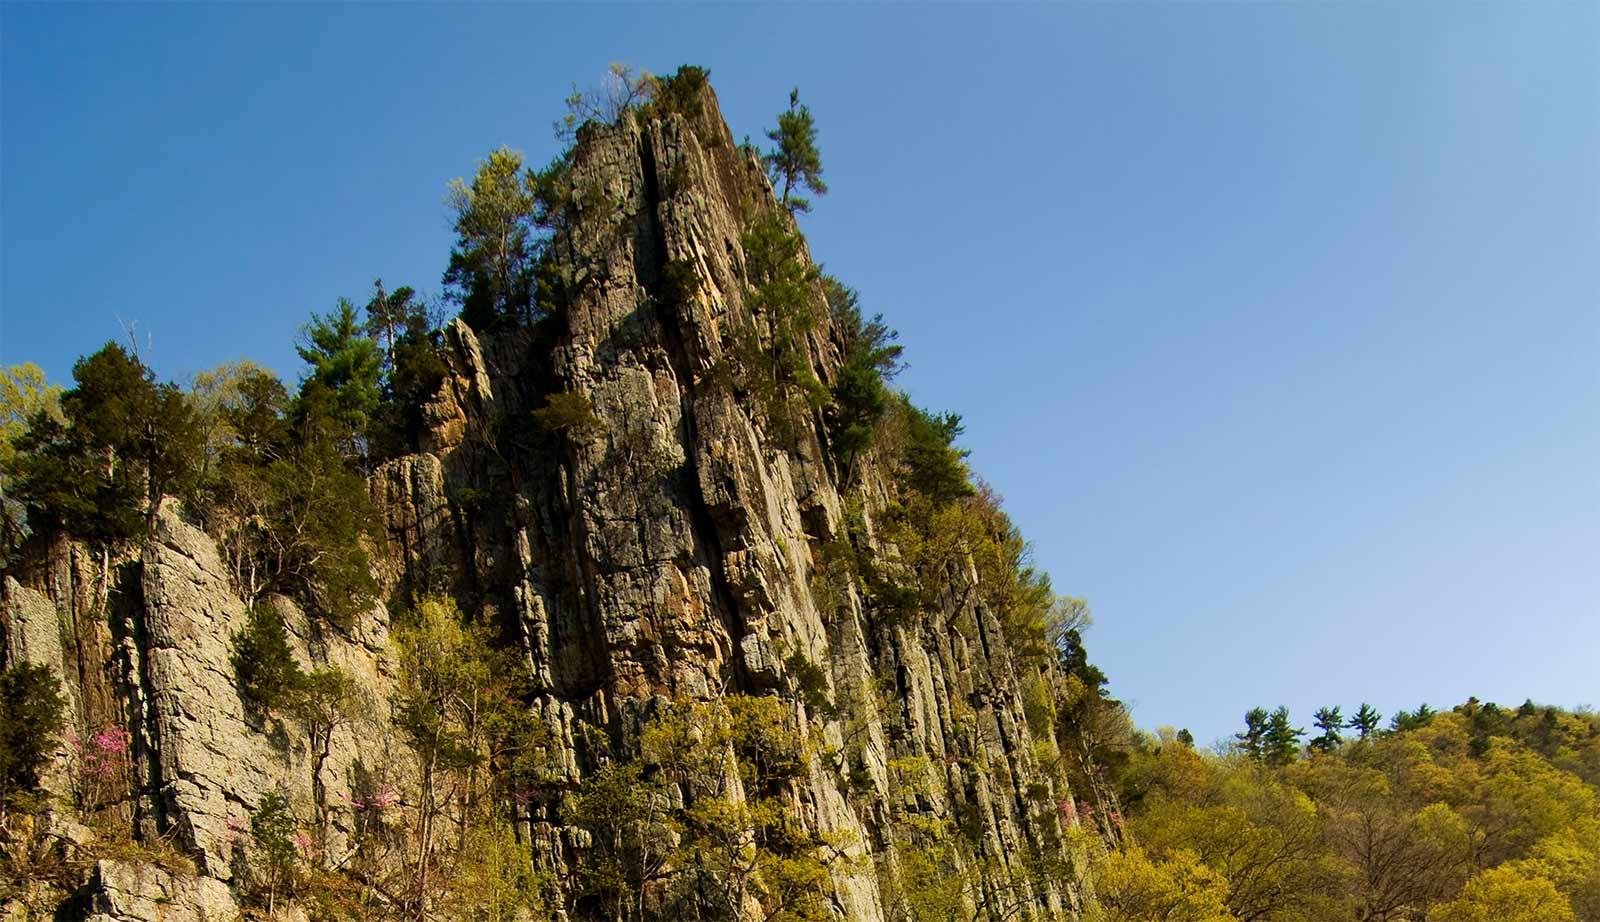 Seneca Rocks - 40 Minutes Away